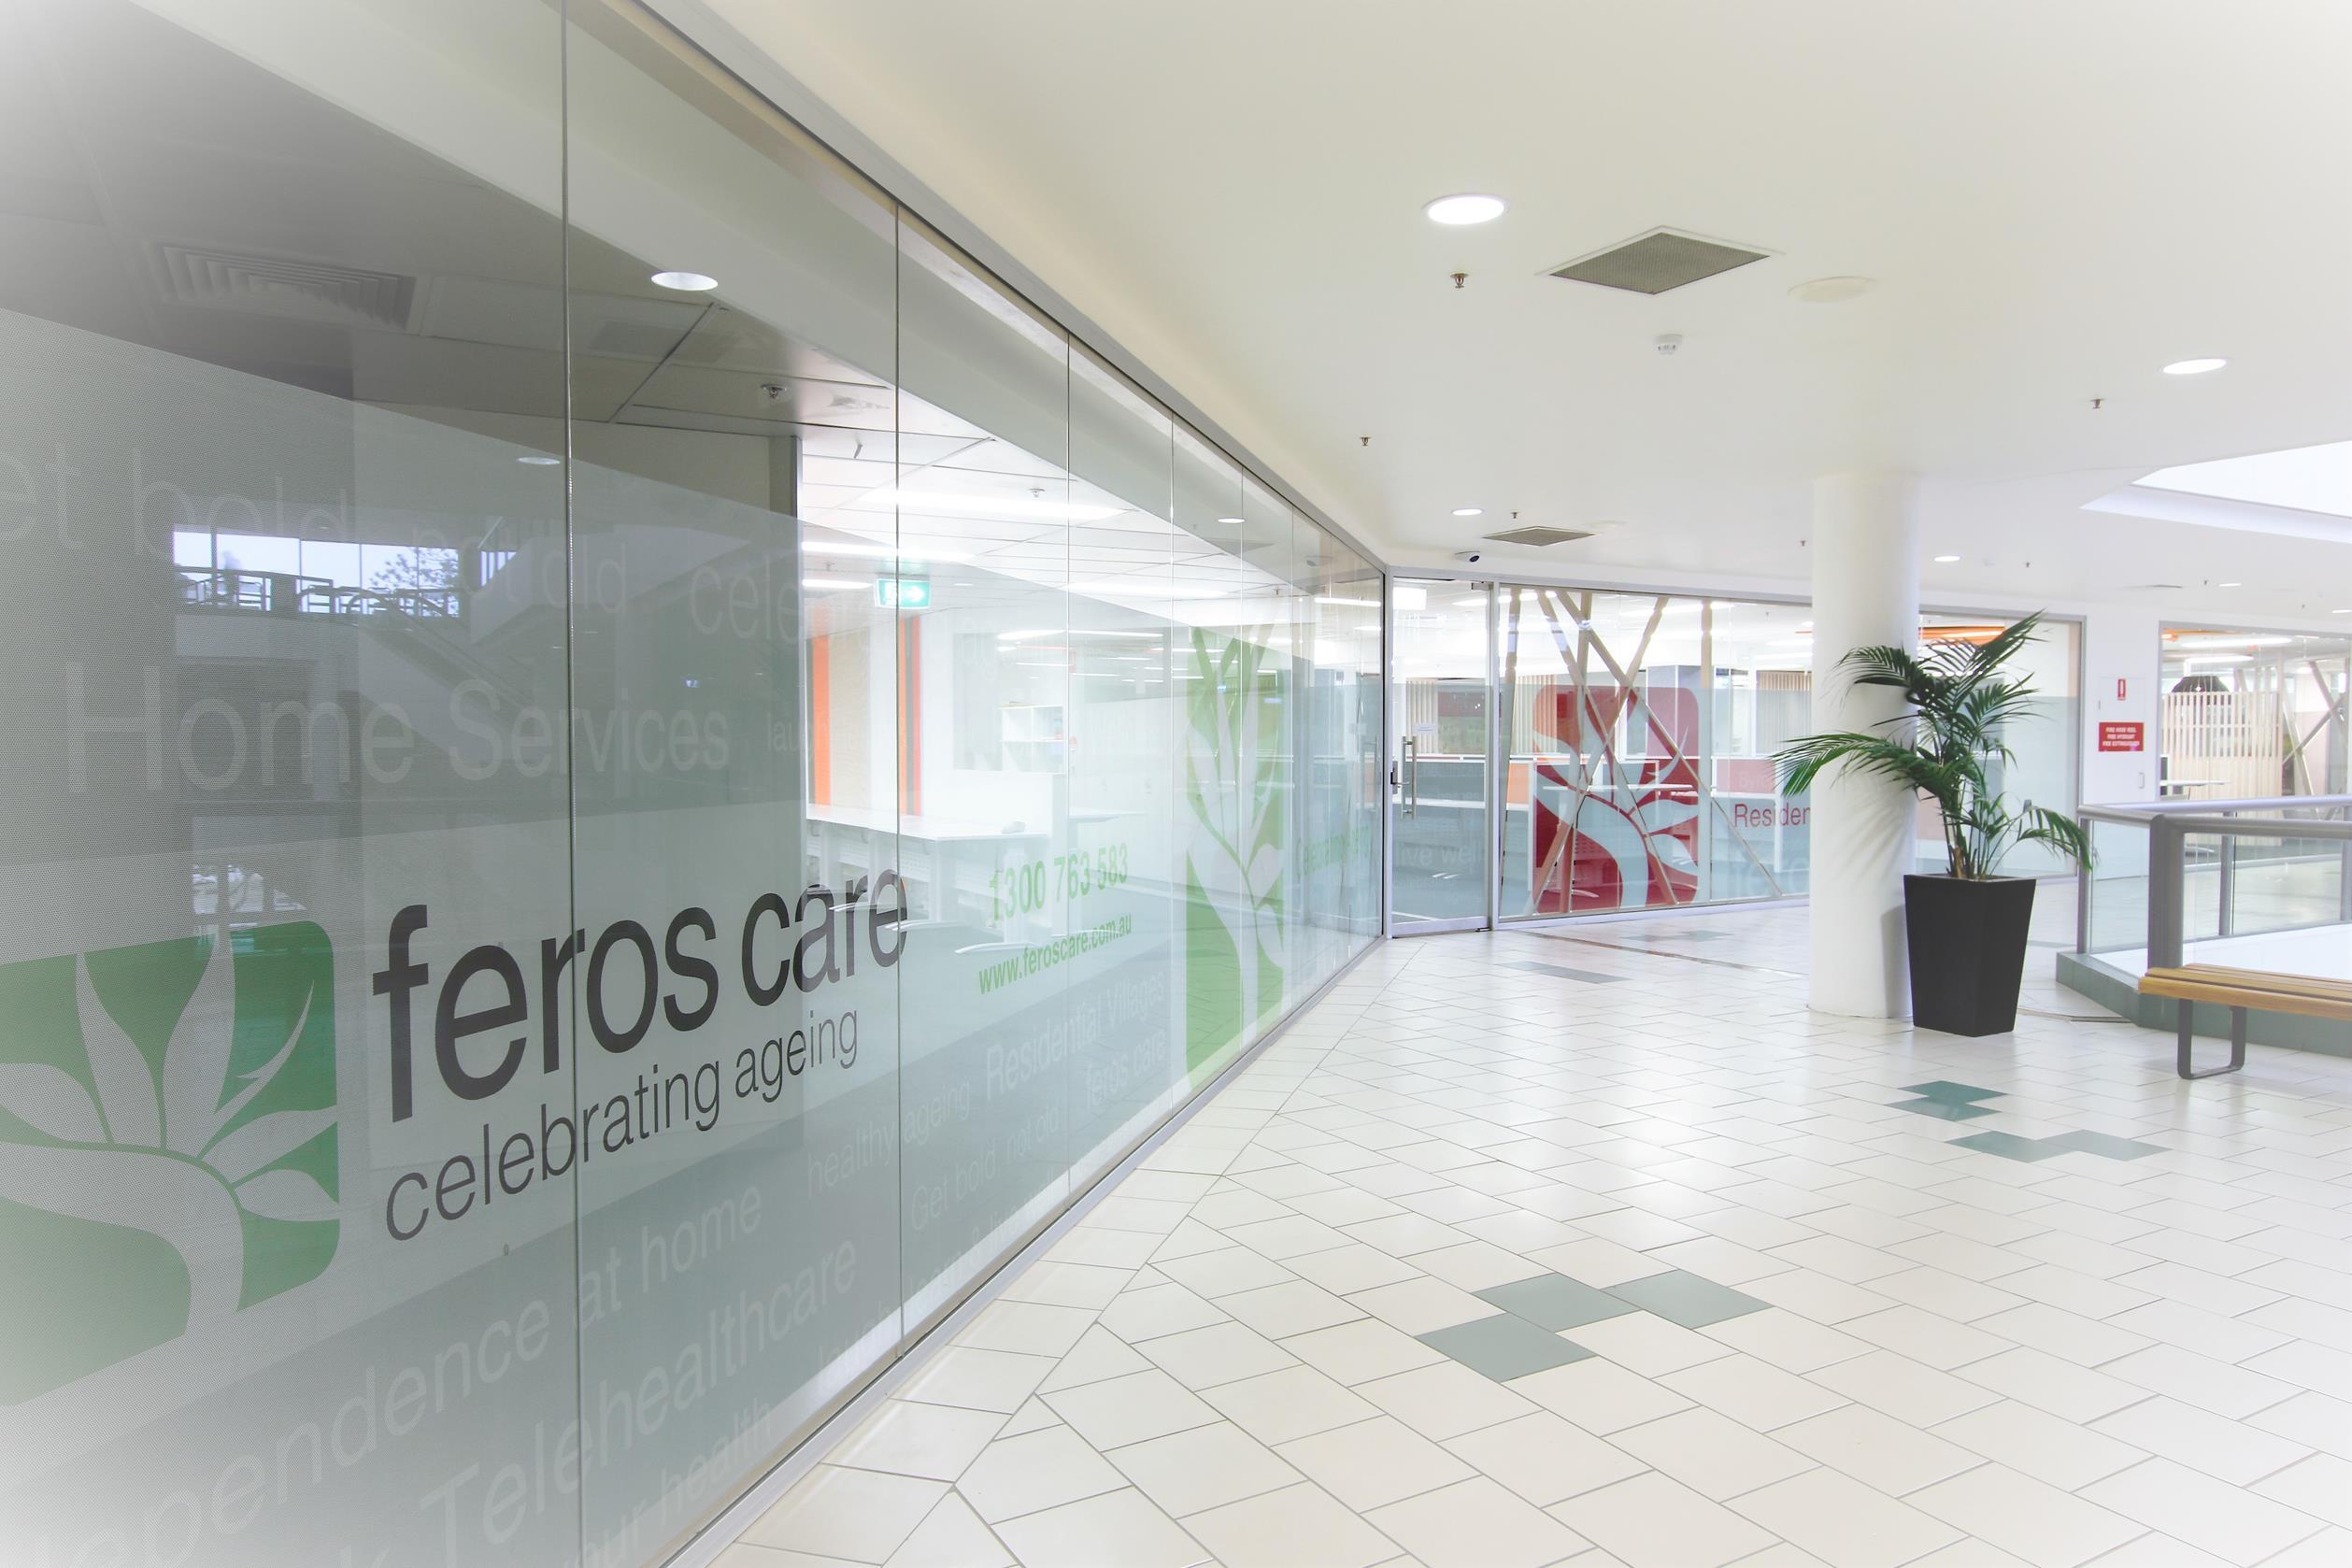 ferros aged care (1)